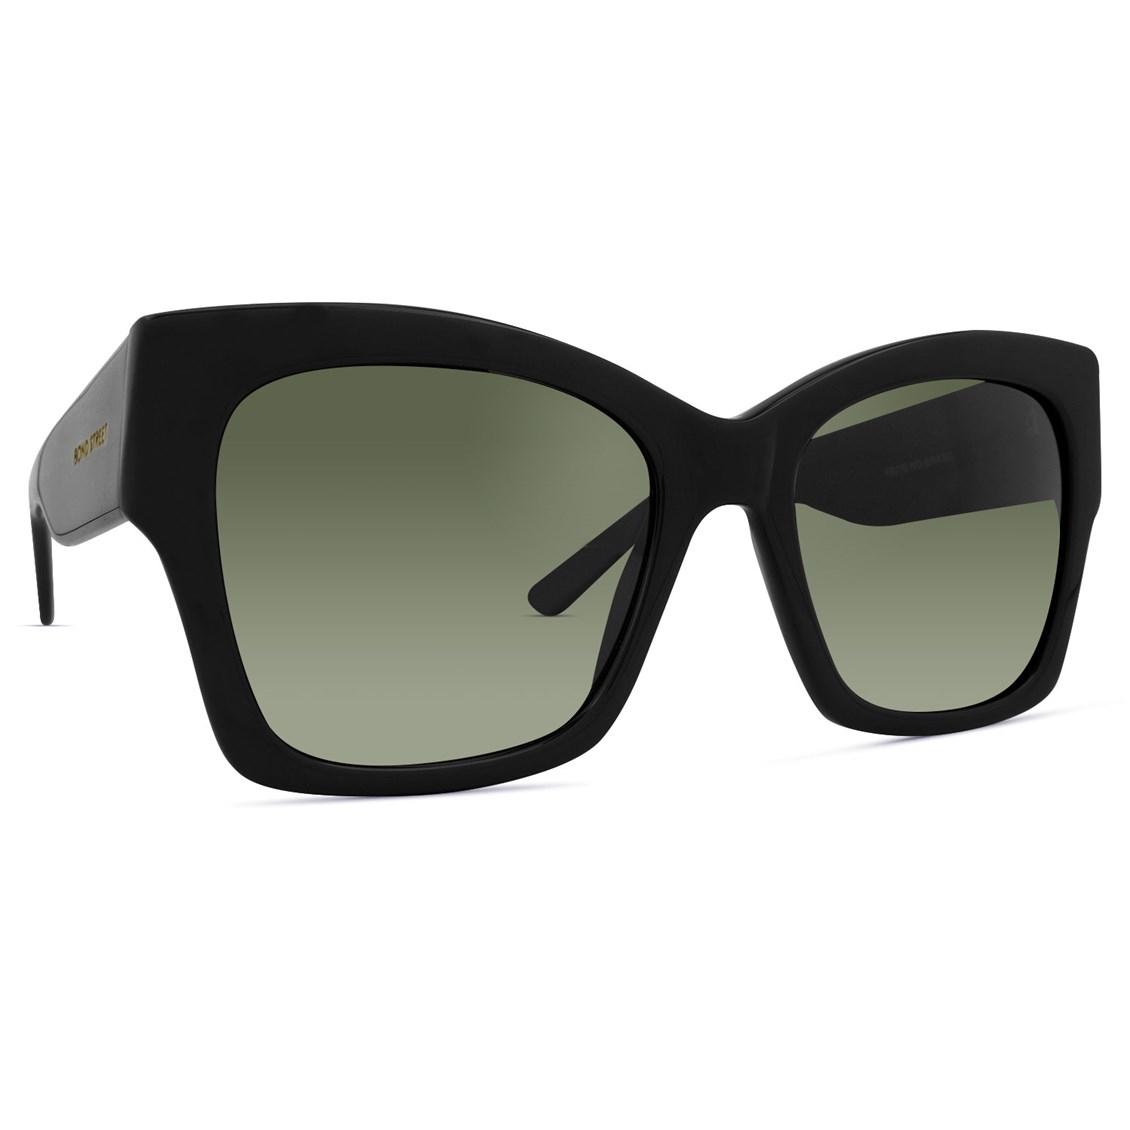 Óculos de Sol Bond Street Portobello 9036 001-53